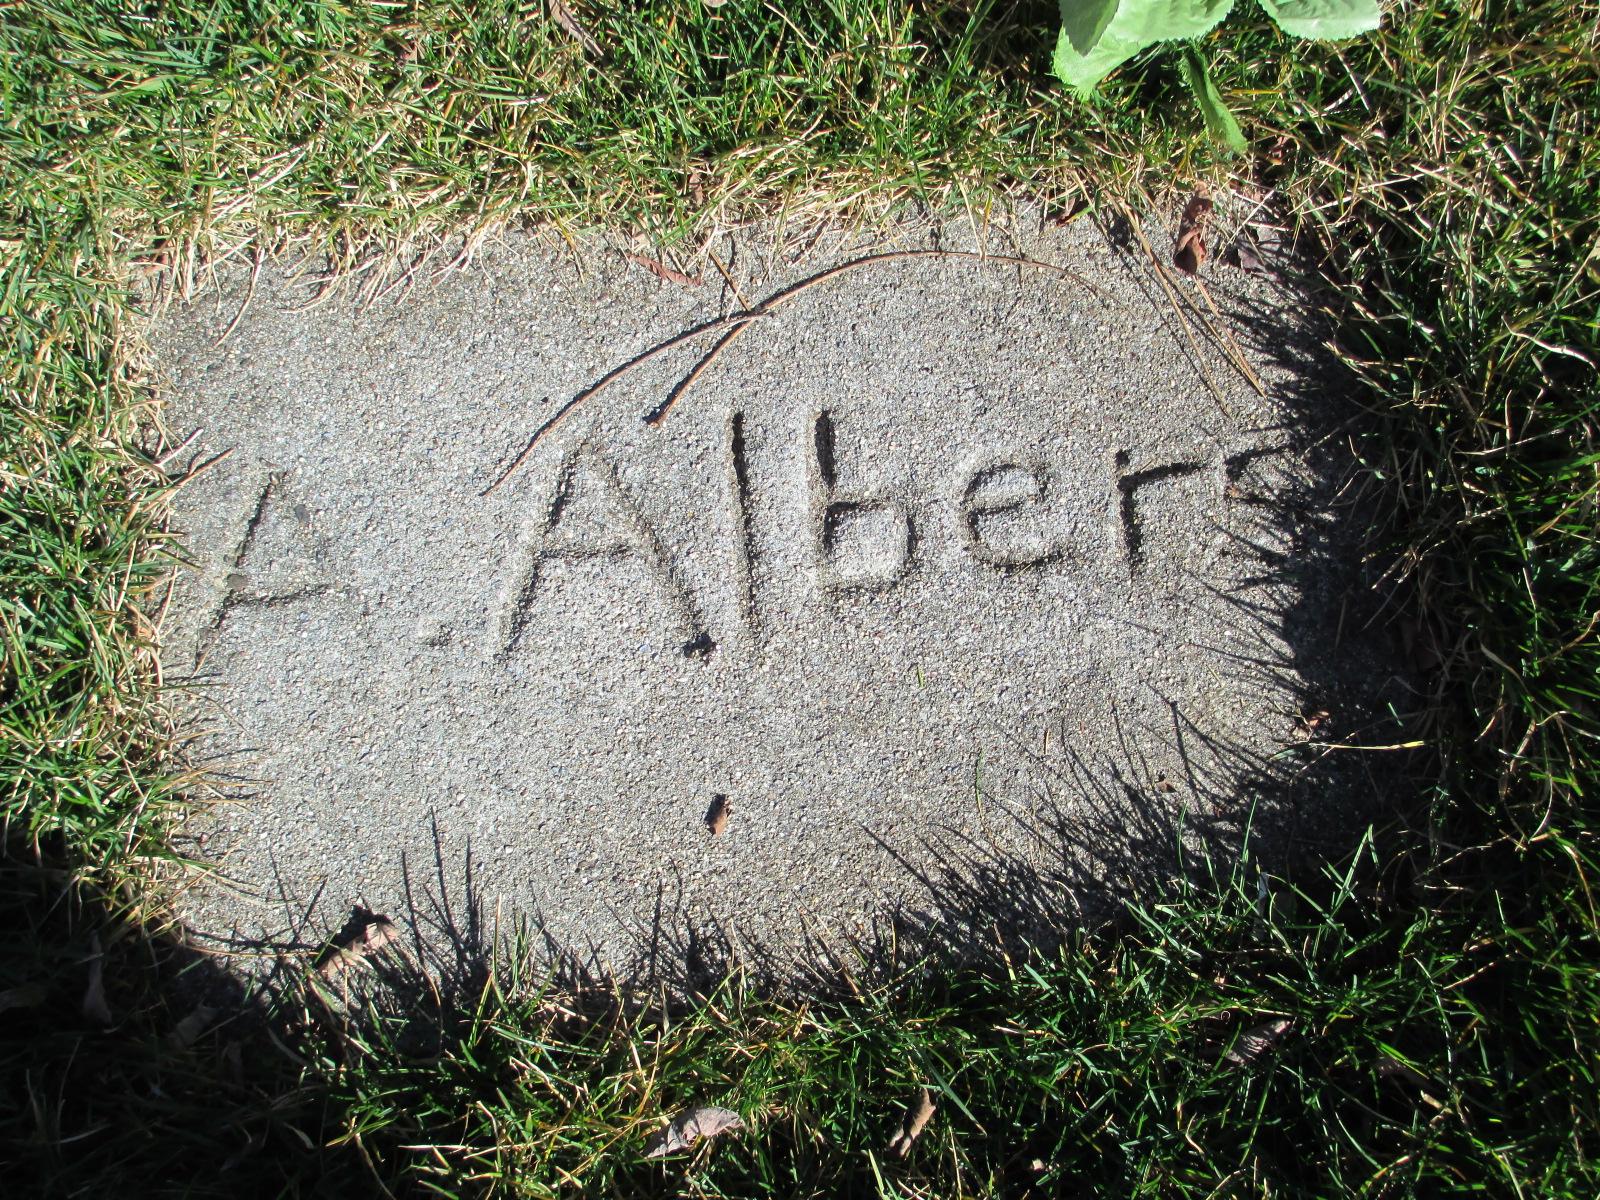 A. Albers